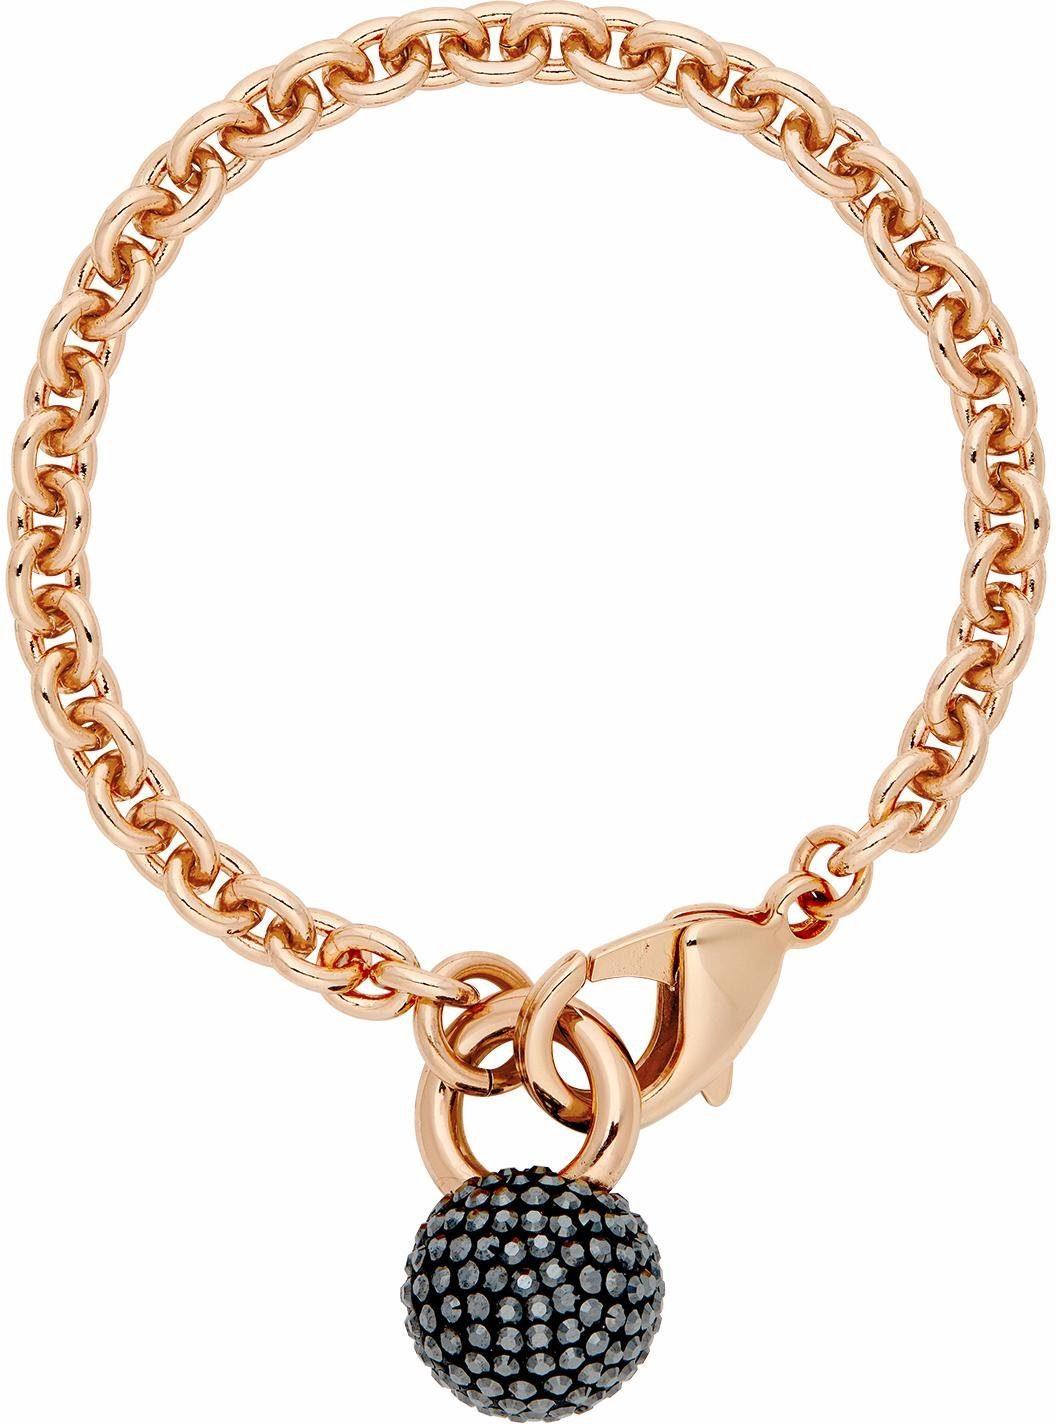 Lolaandgrace Armband »RIO CHAIN BRACELET, 5251830« mit Swarovski® Kristallen